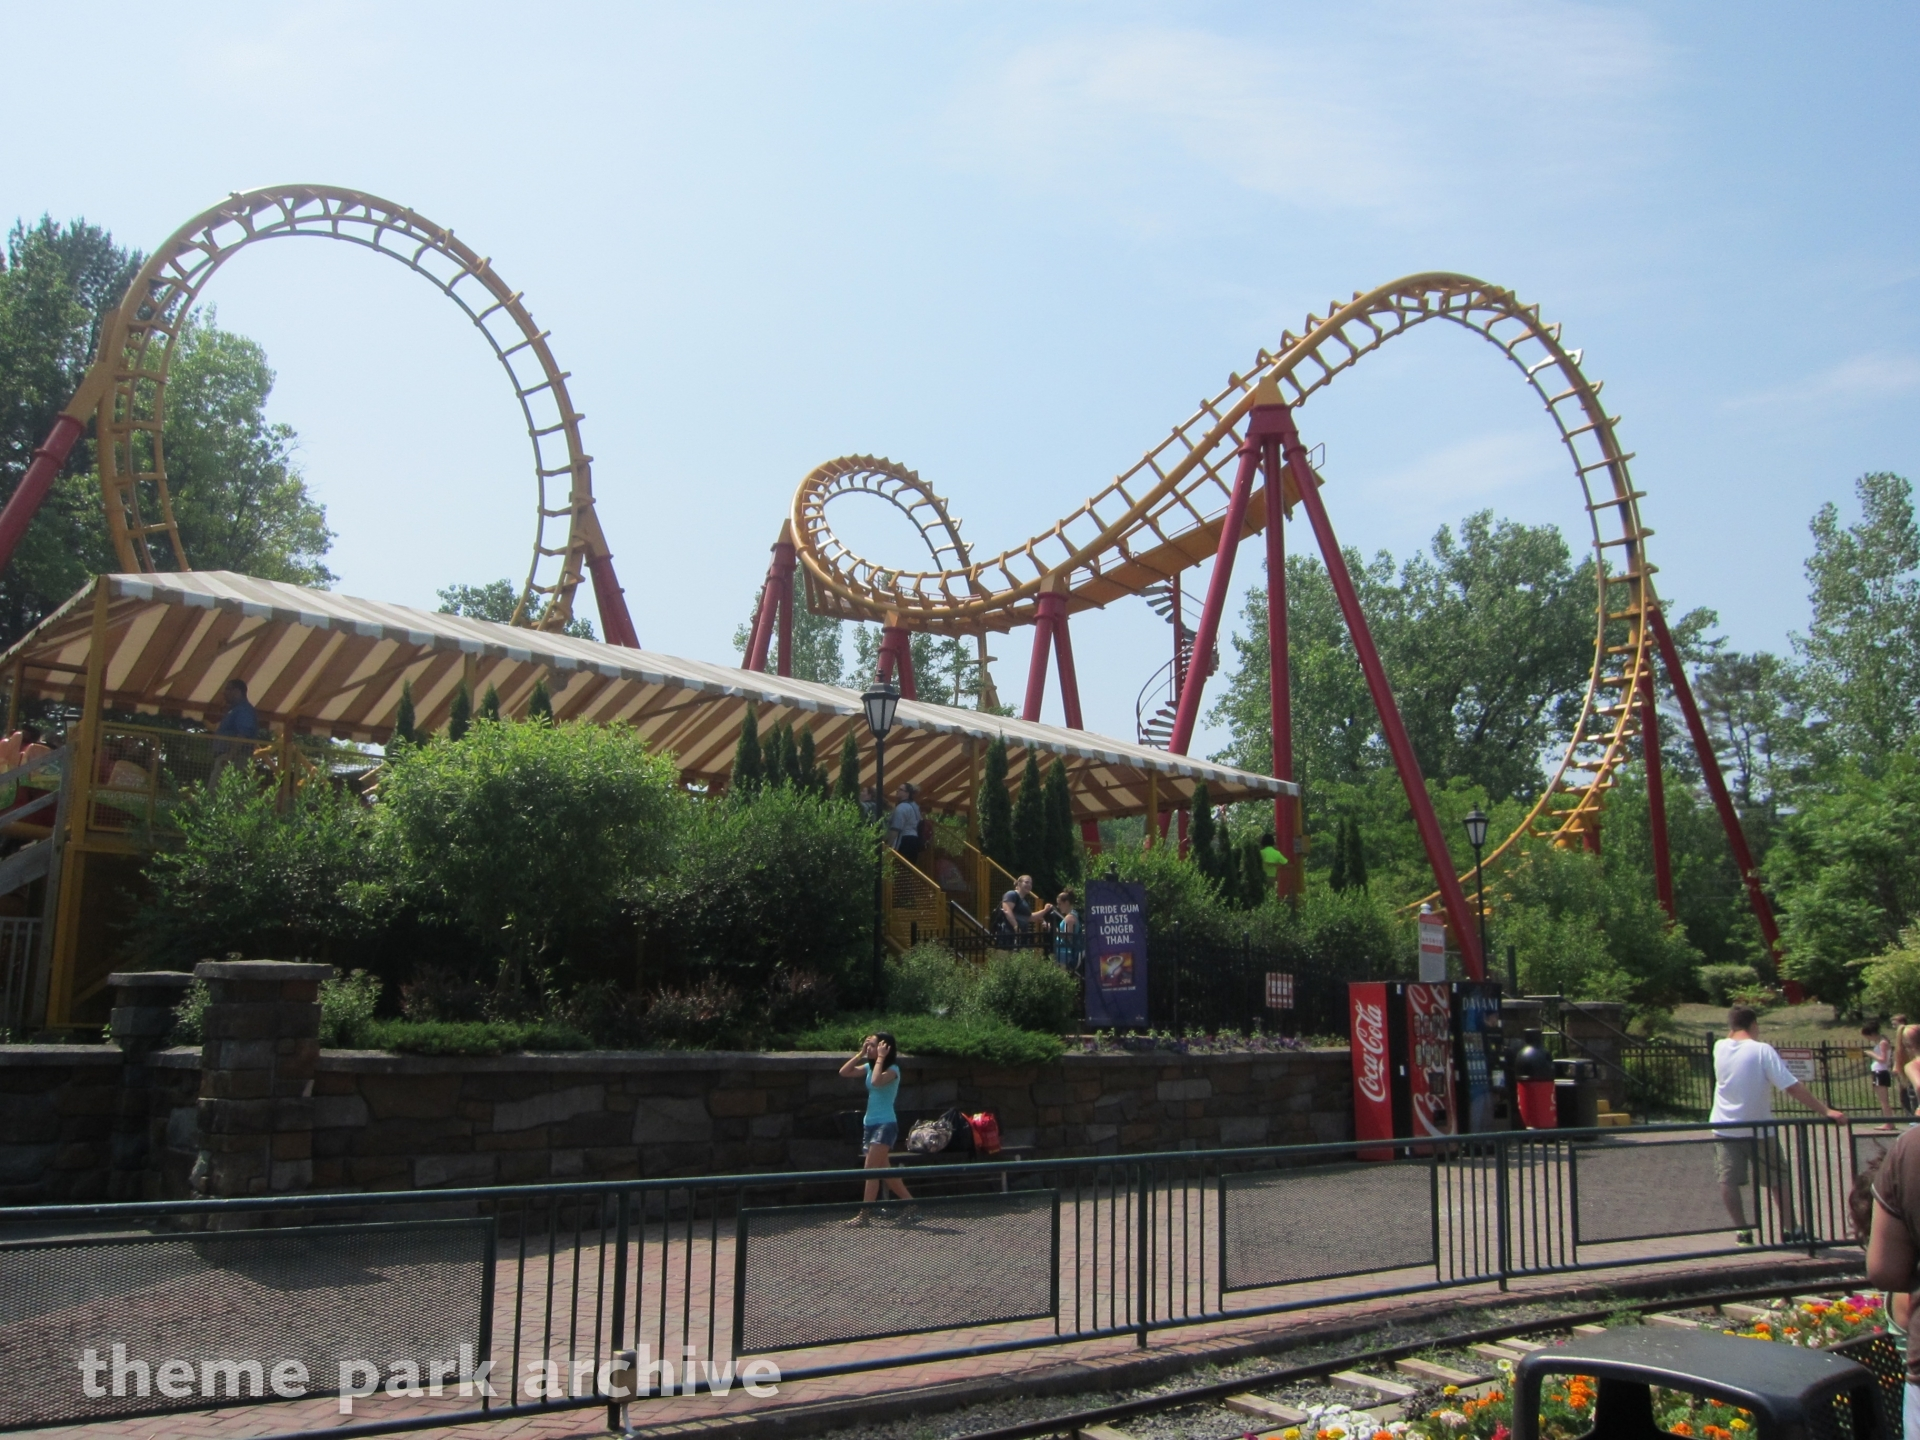 Boomerang at Great Escape & Splashwater Kingdom